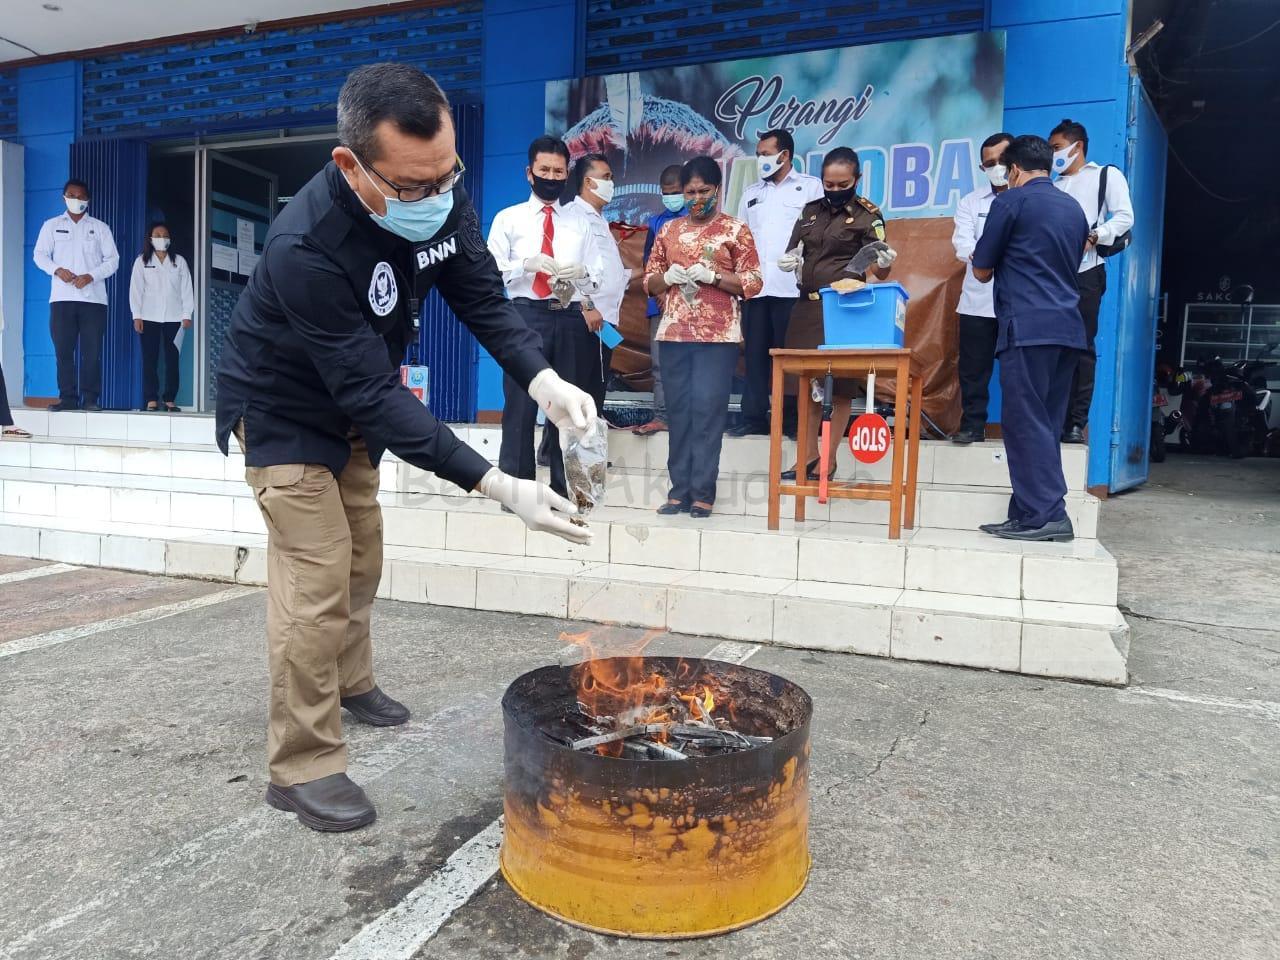 BNN Papua Barat Musnahkan 1.7 Kilogram Ganja 3 IMG 20200907 WA0030